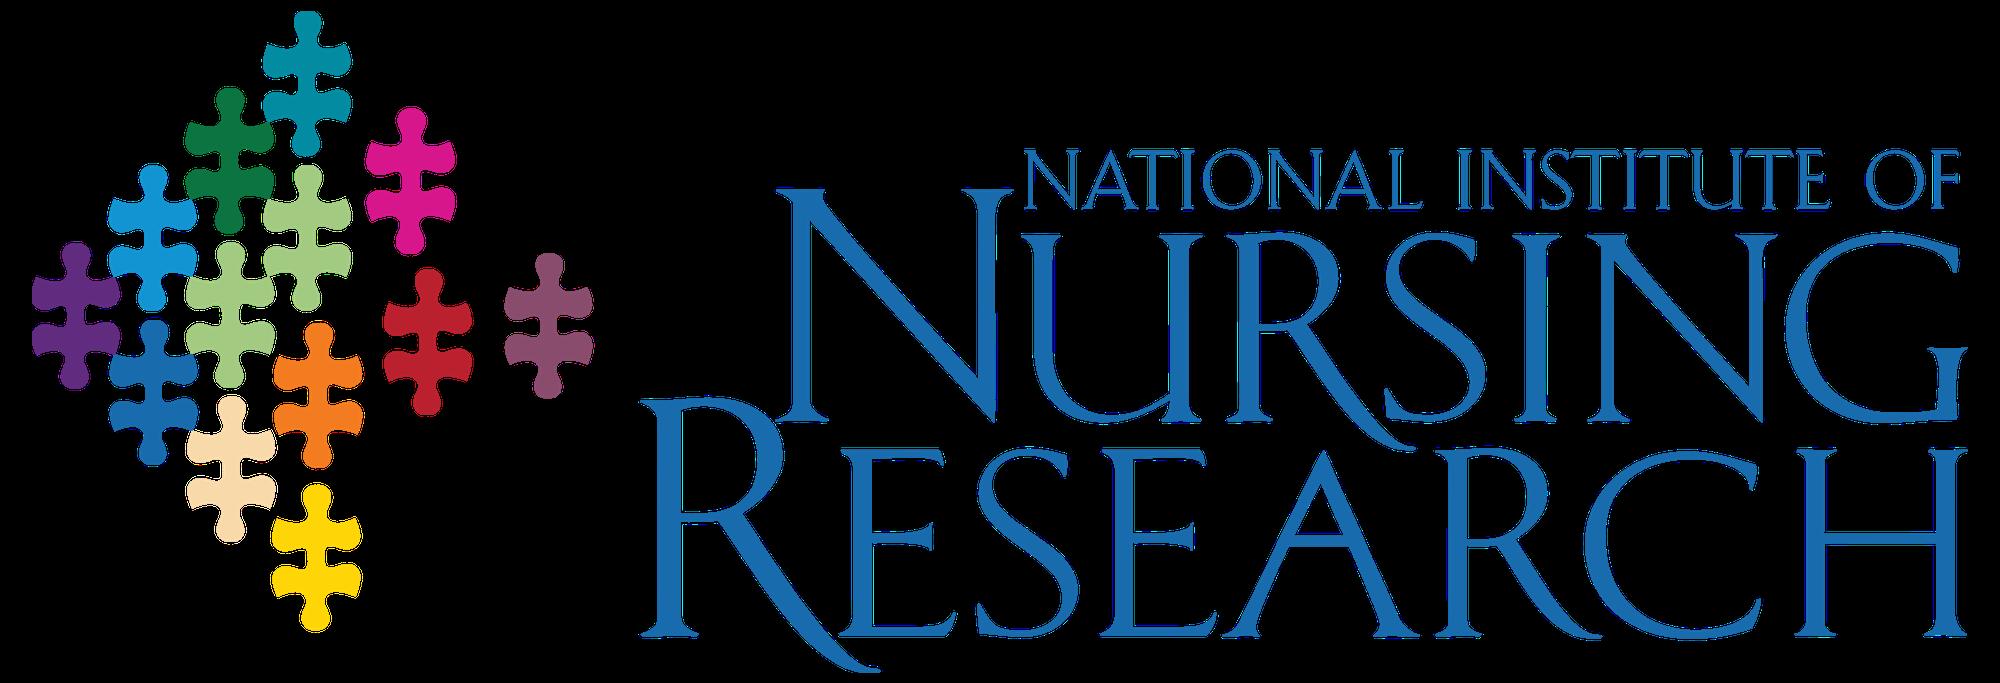 NINR- nursing